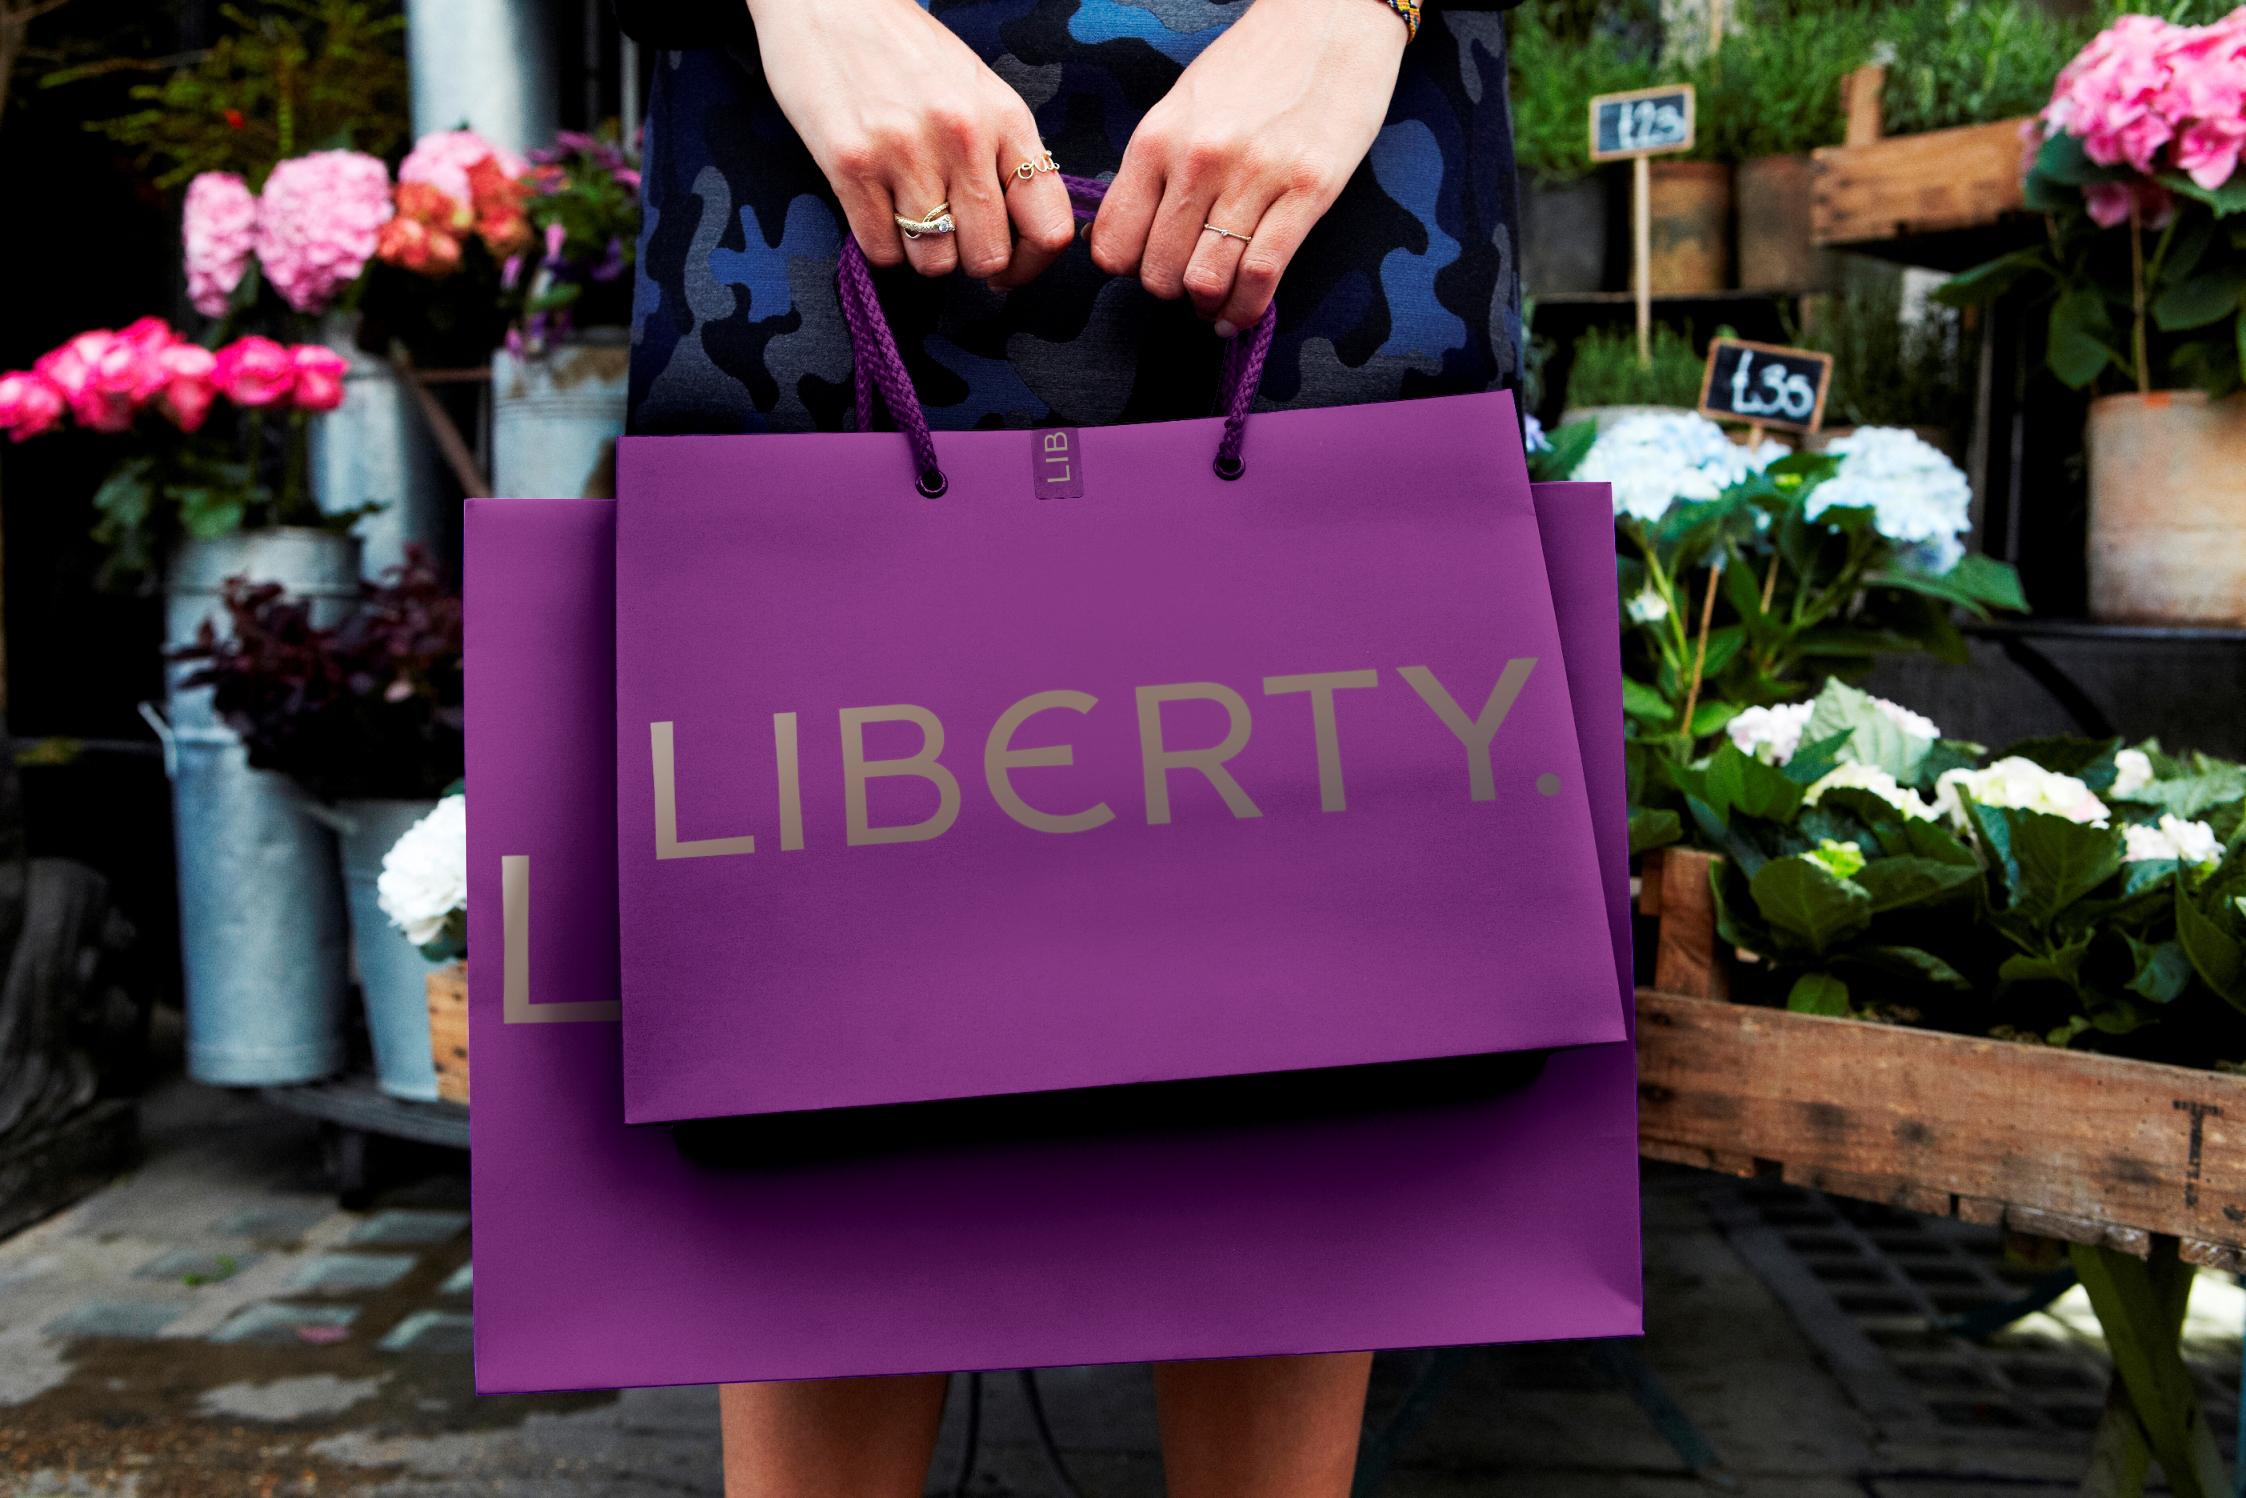 Liberty's latest logo.